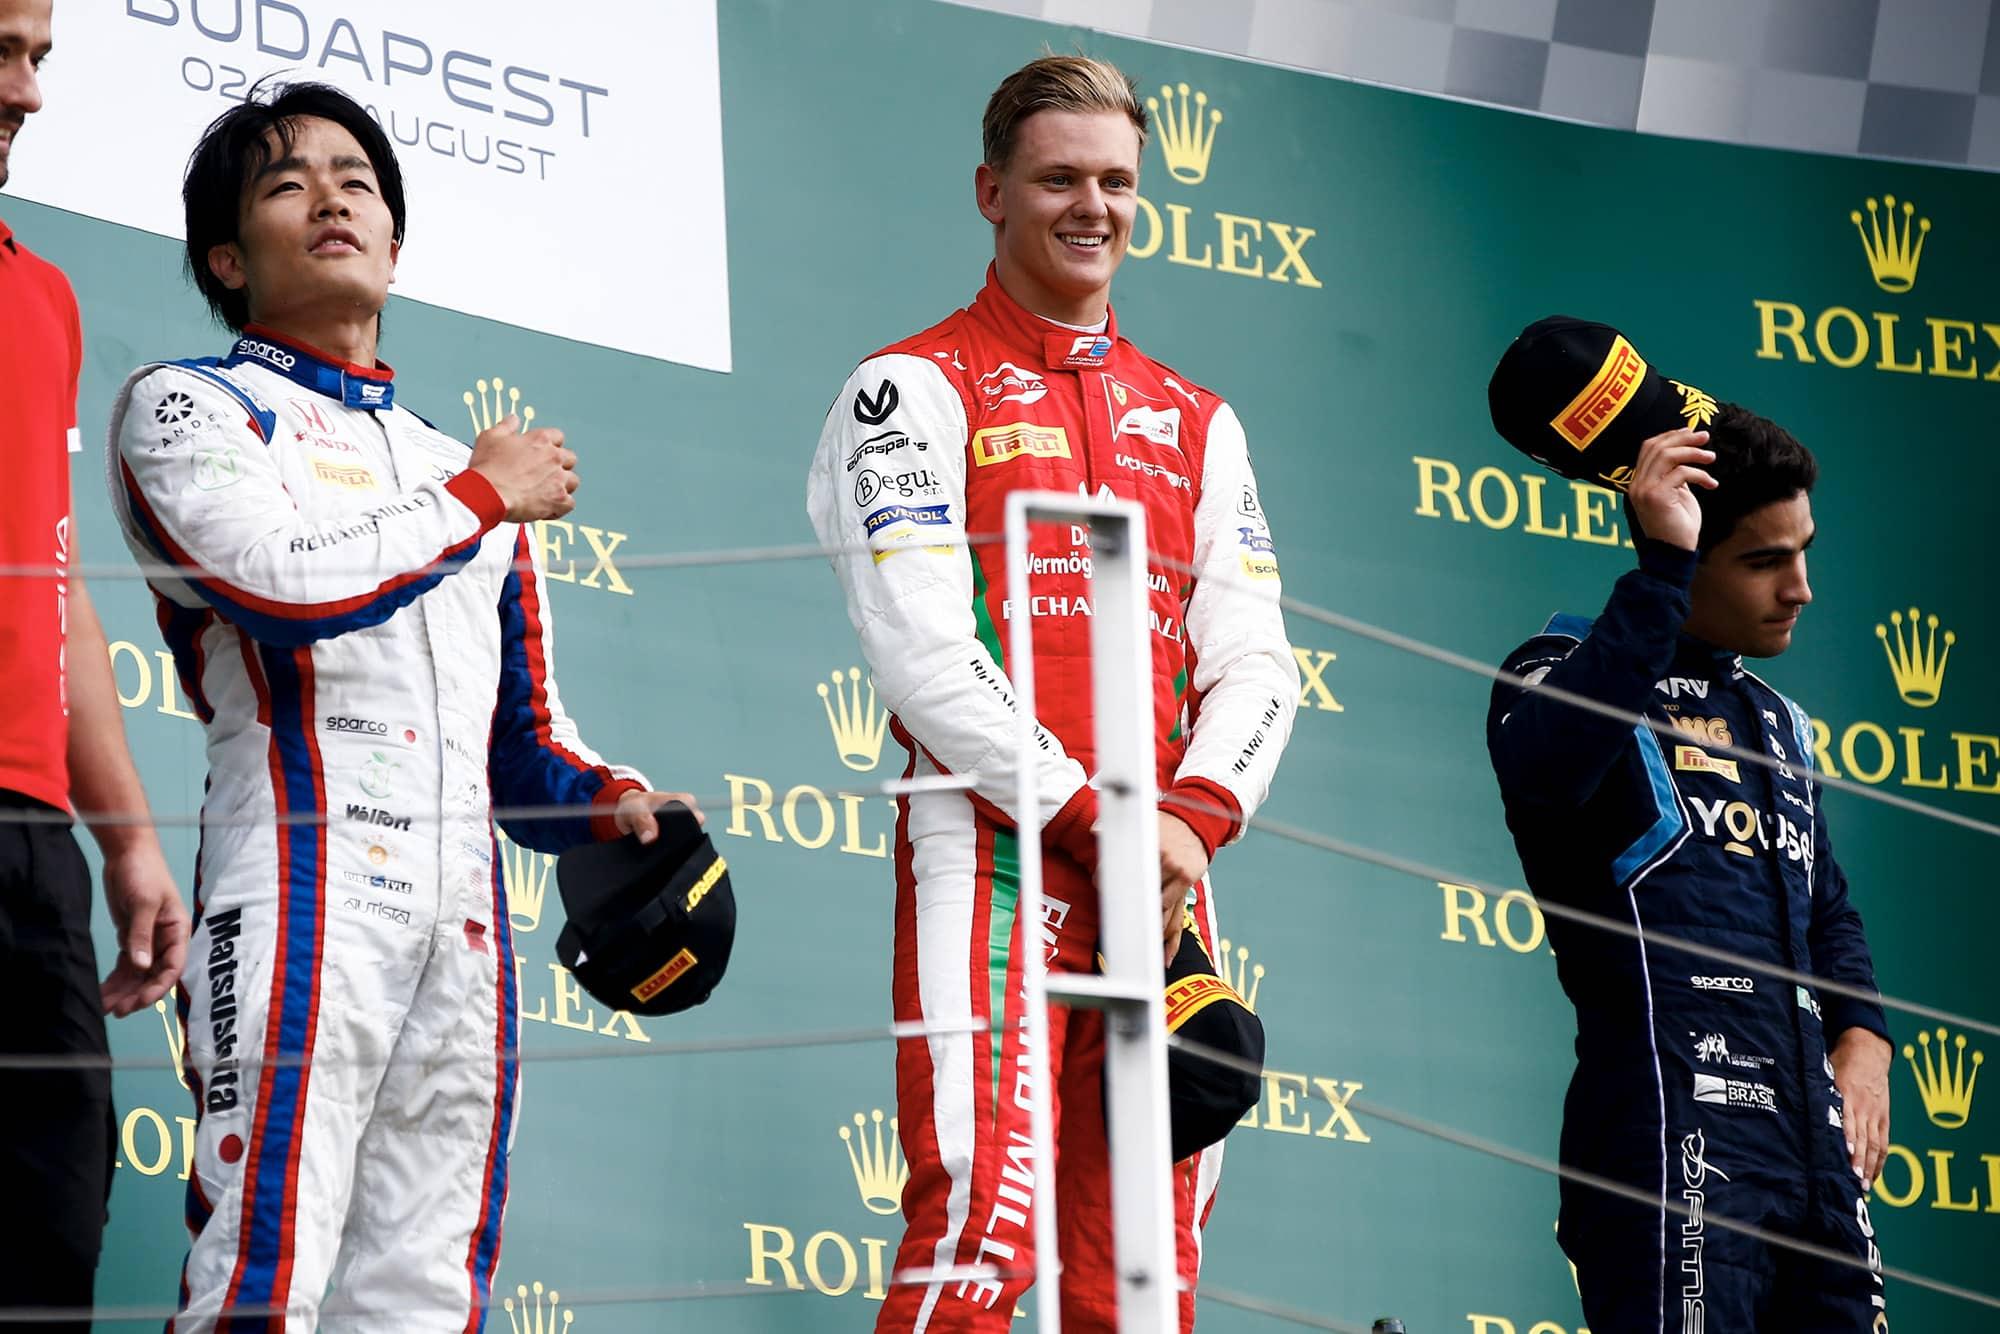 Mick Schumacher celebrates victory at the Hungaroring in the 2019 Formula 2 season